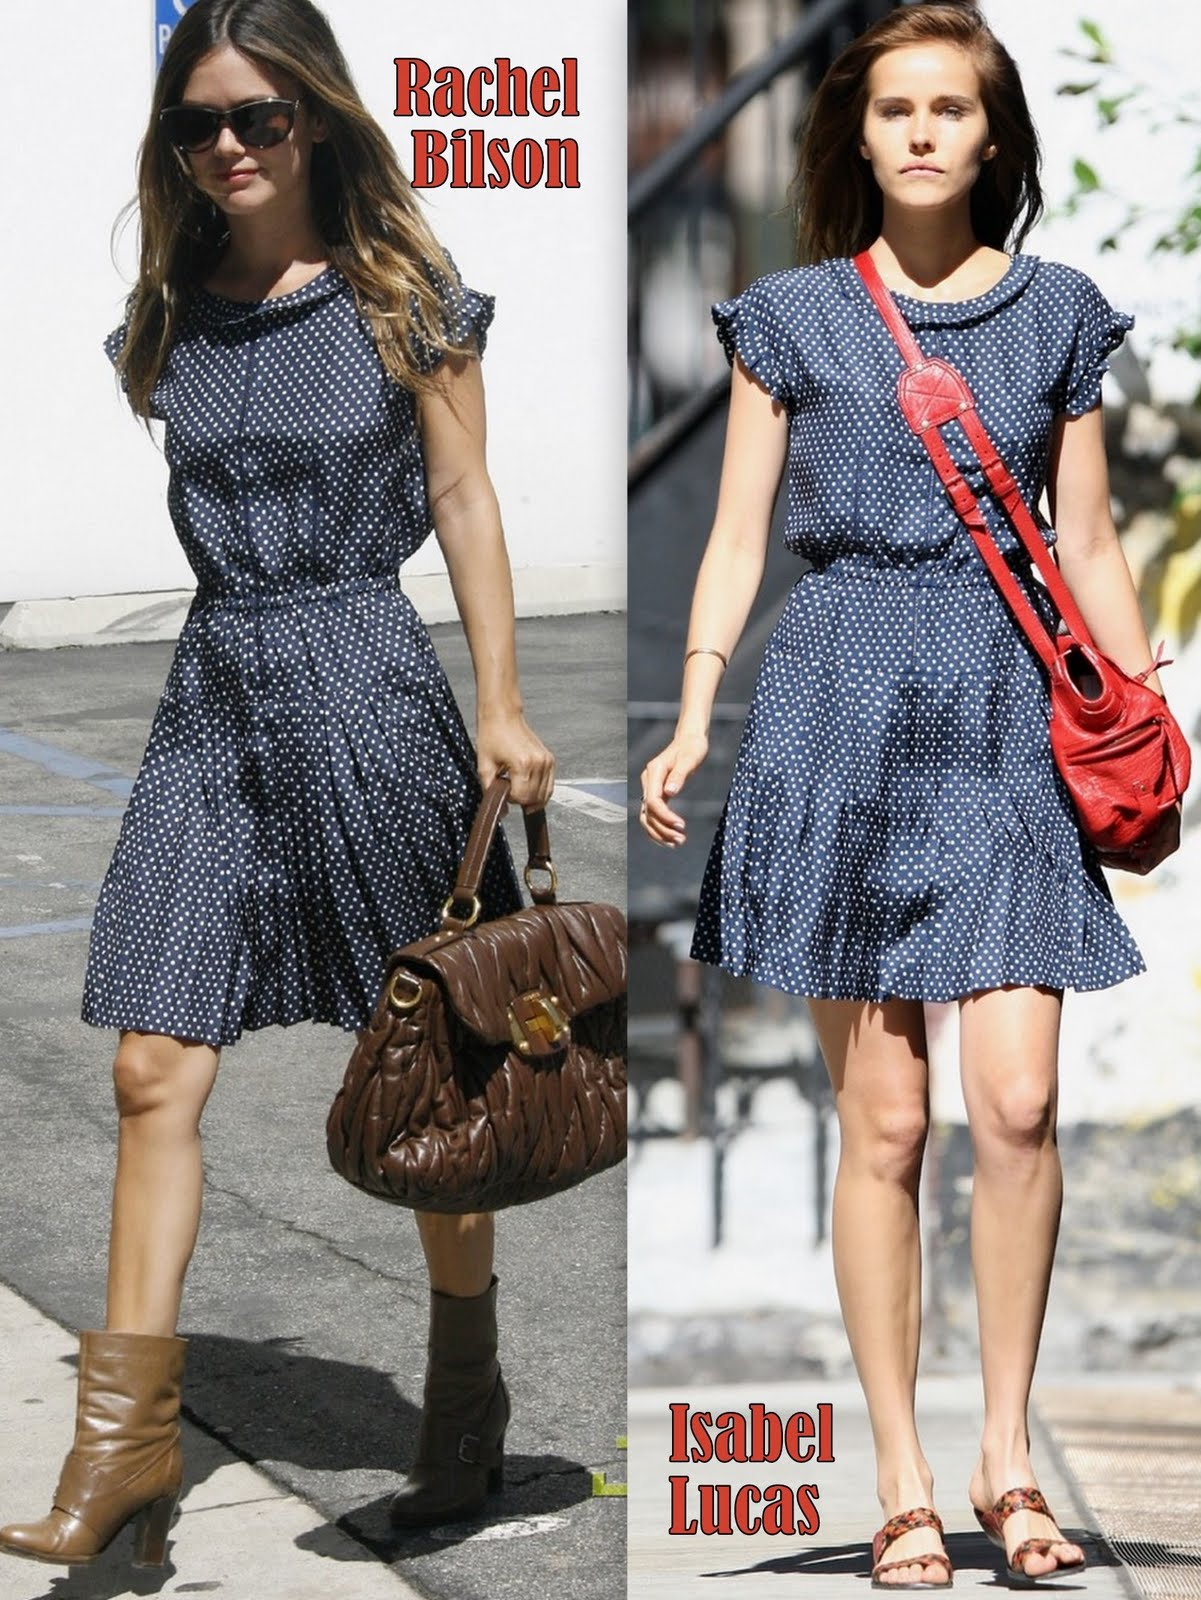 http://1.bp.blogspot.com/_xC9ozoZm8n4/TJcaKZ3St6I/AAAAAAAABJw/JmLgd2b5vQE/s1600/The+Fashion+Dealer+Rachel+Bilson+vs+Isabel+lucas+polka+dot+dress.jpg